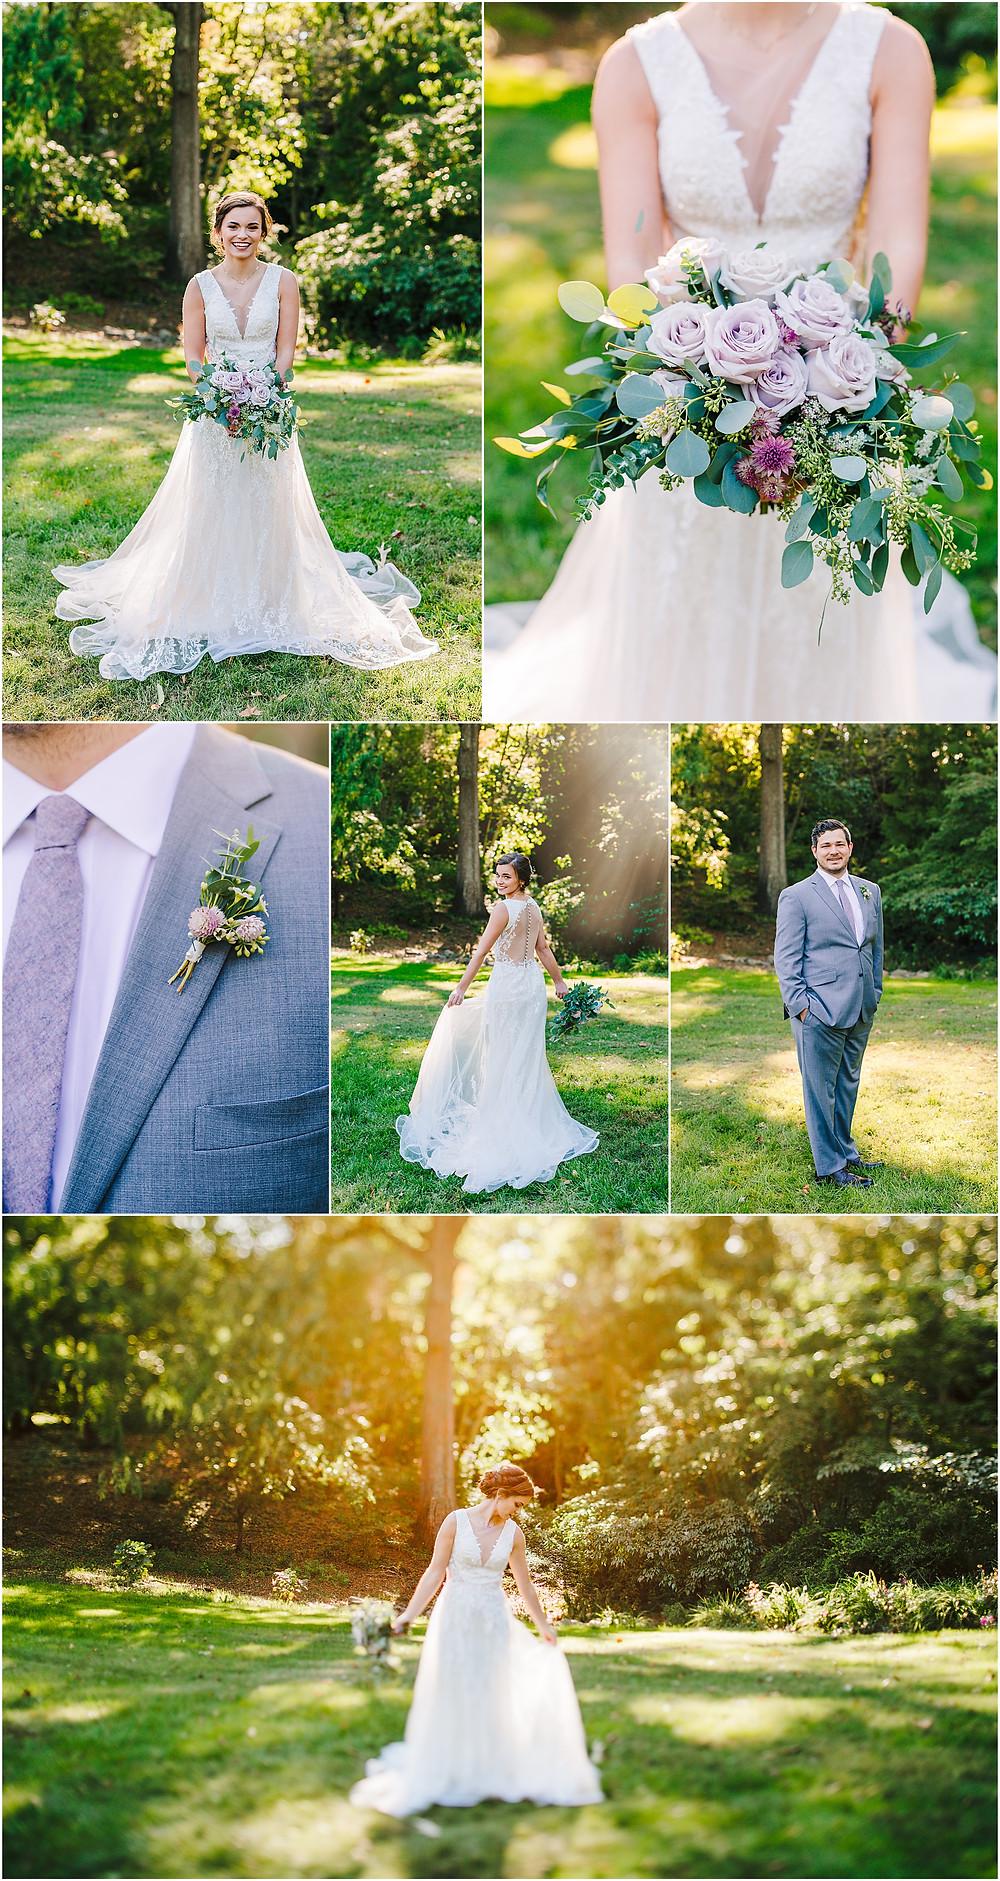 Sunny bridals at Maryland Wedding Venue at Historic London Town and Gardens